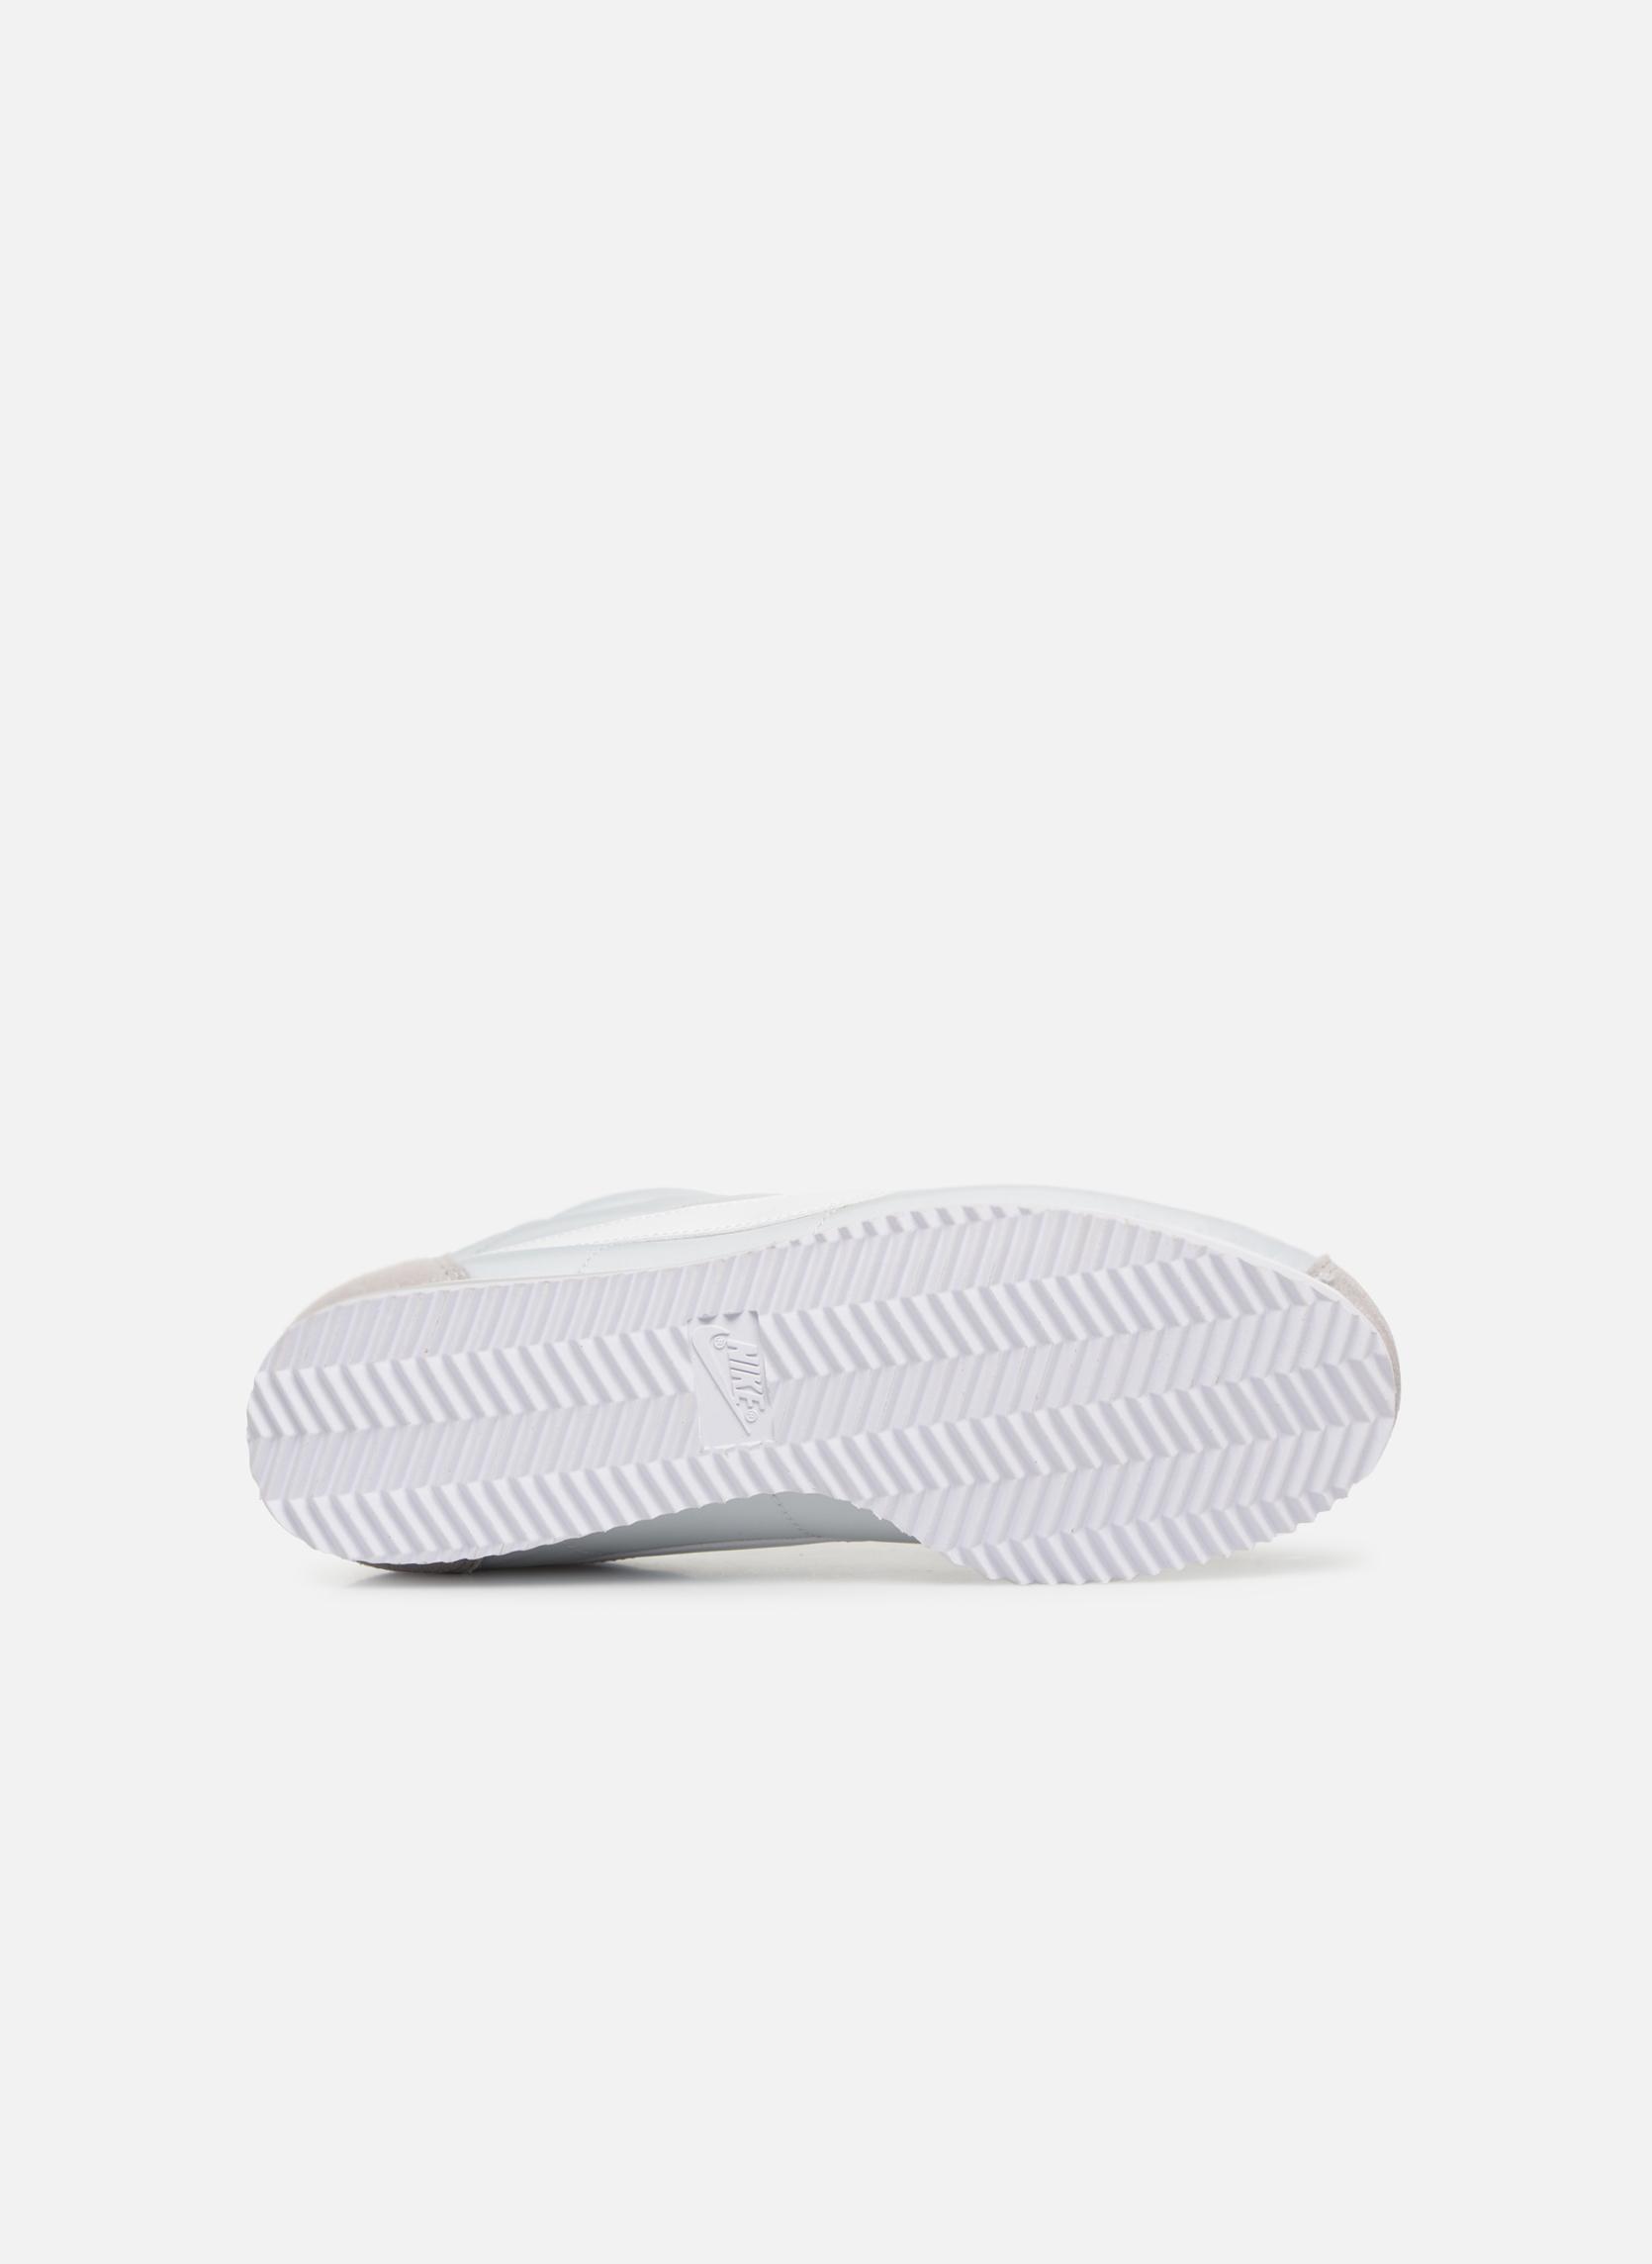 Wmns Classic Cortez Nylon Pure Platinum/White